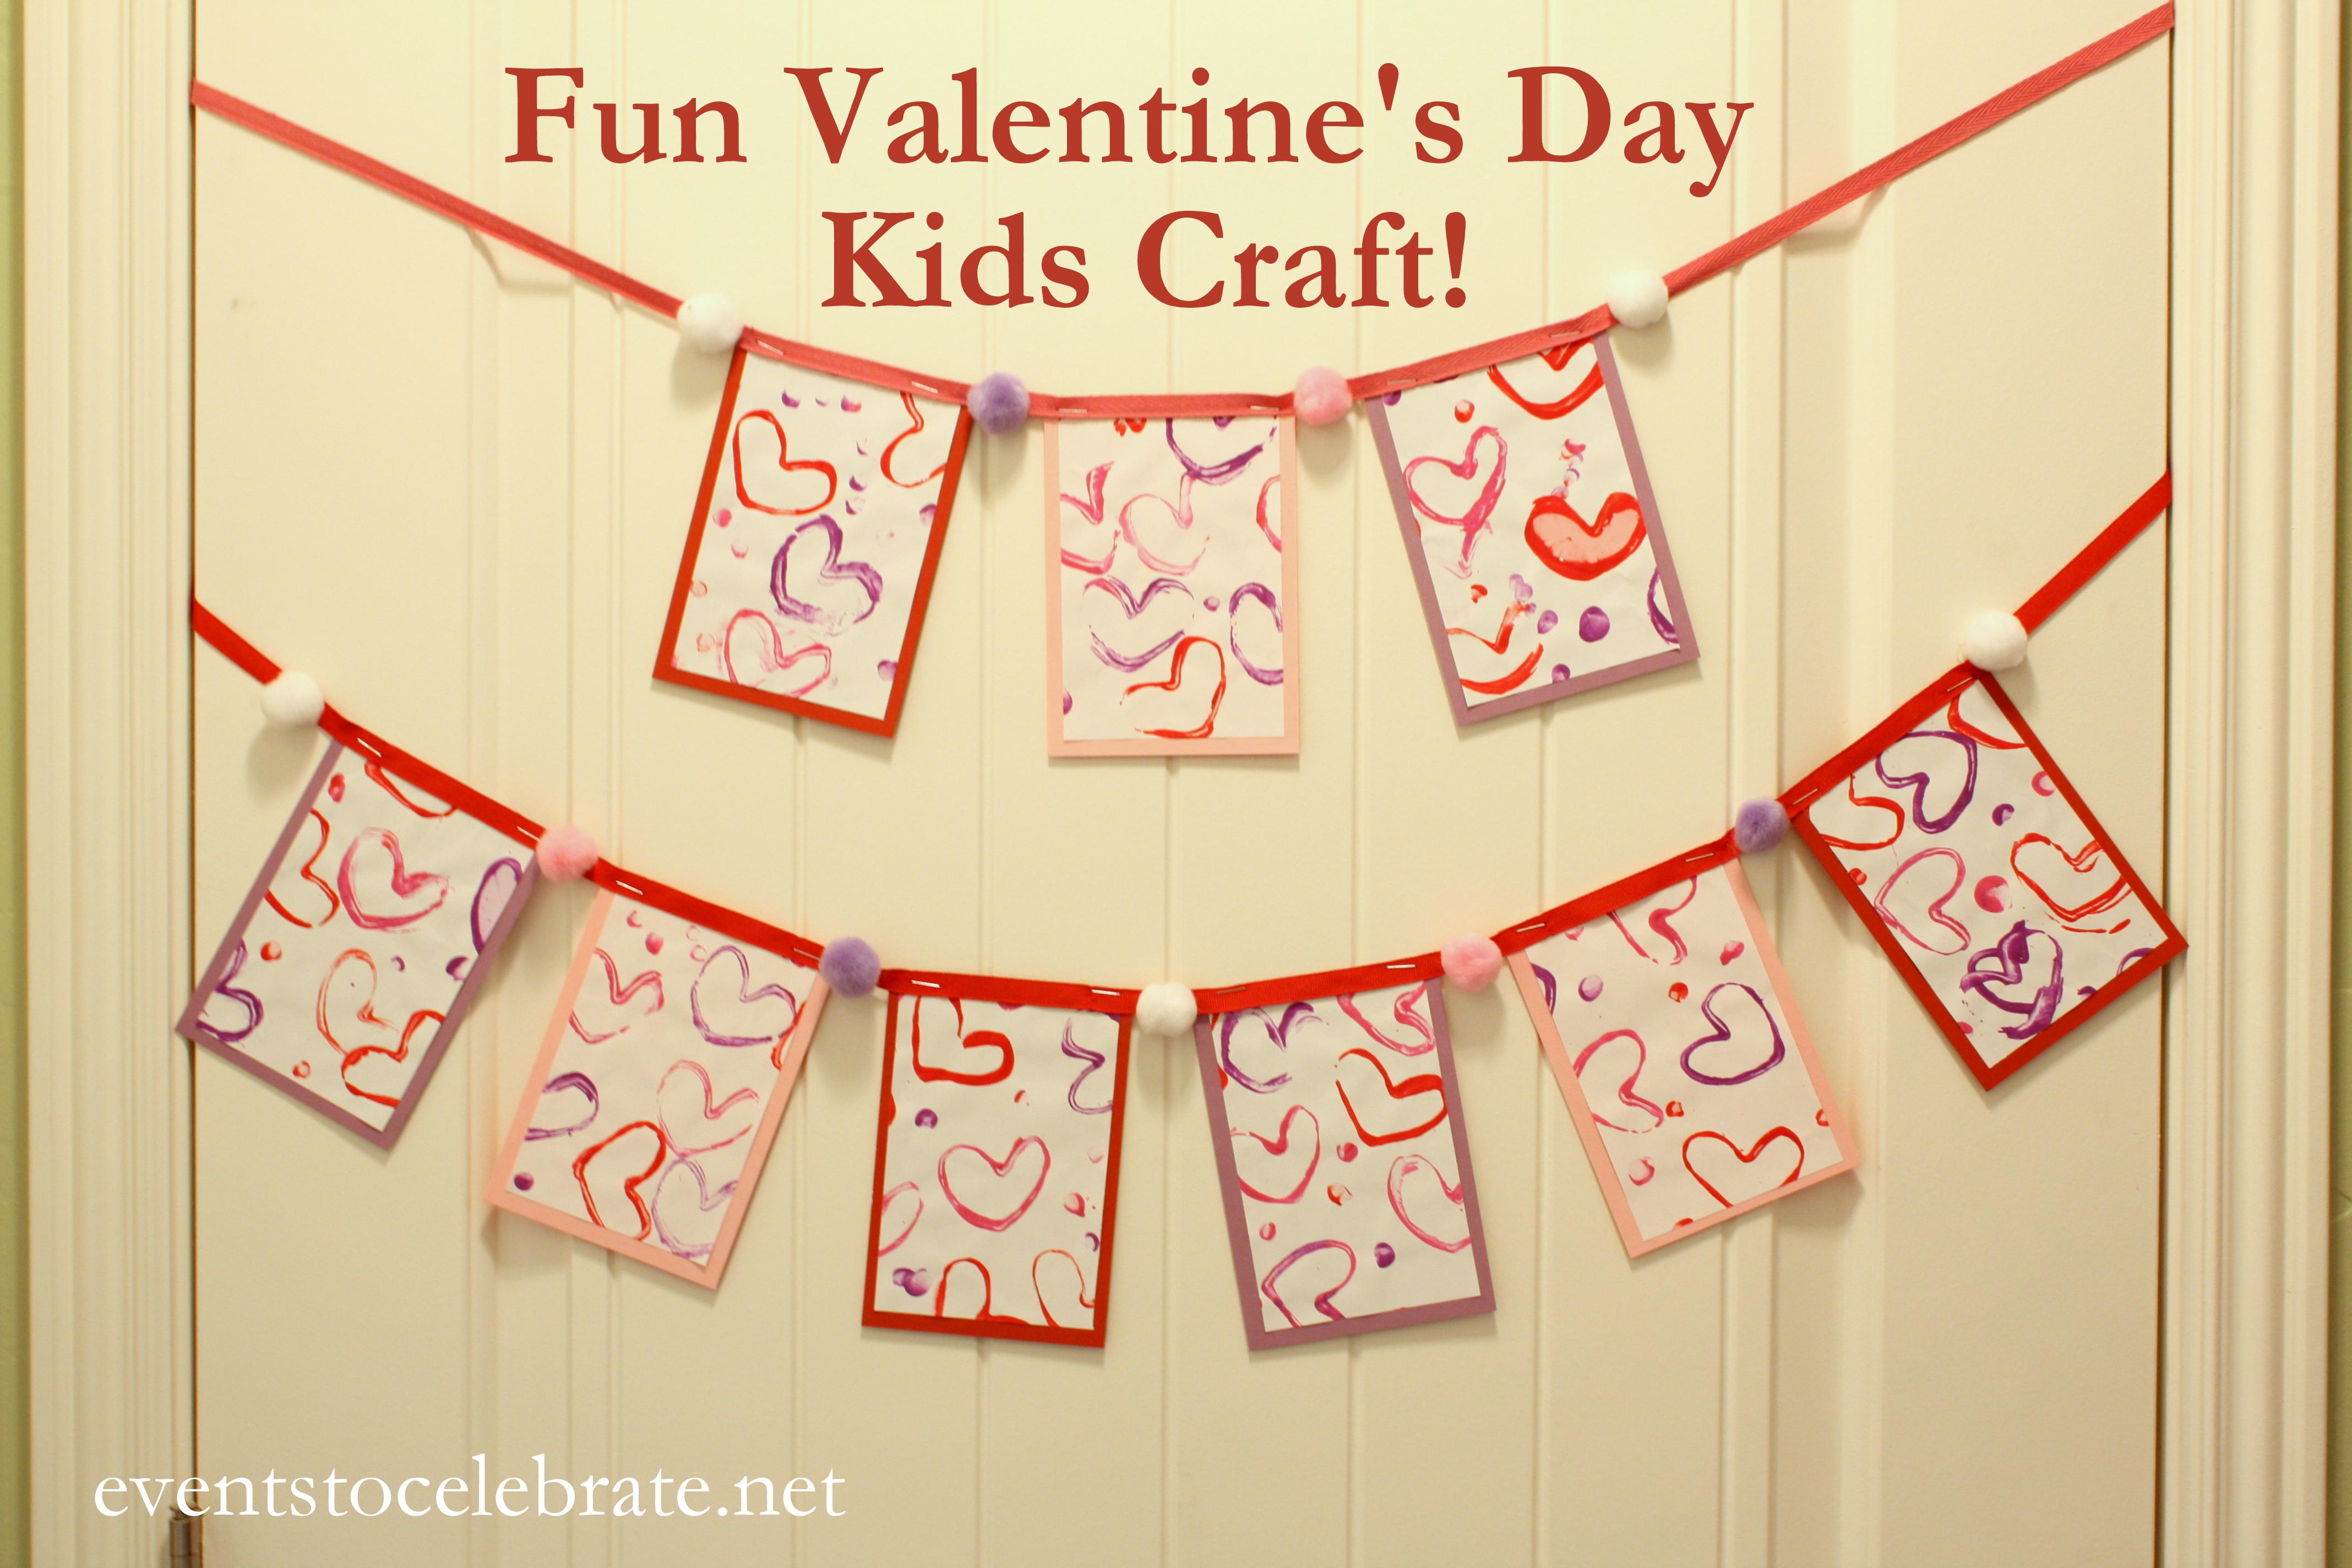 Valentines Day Craft for Kids - eventstocelebrate.net